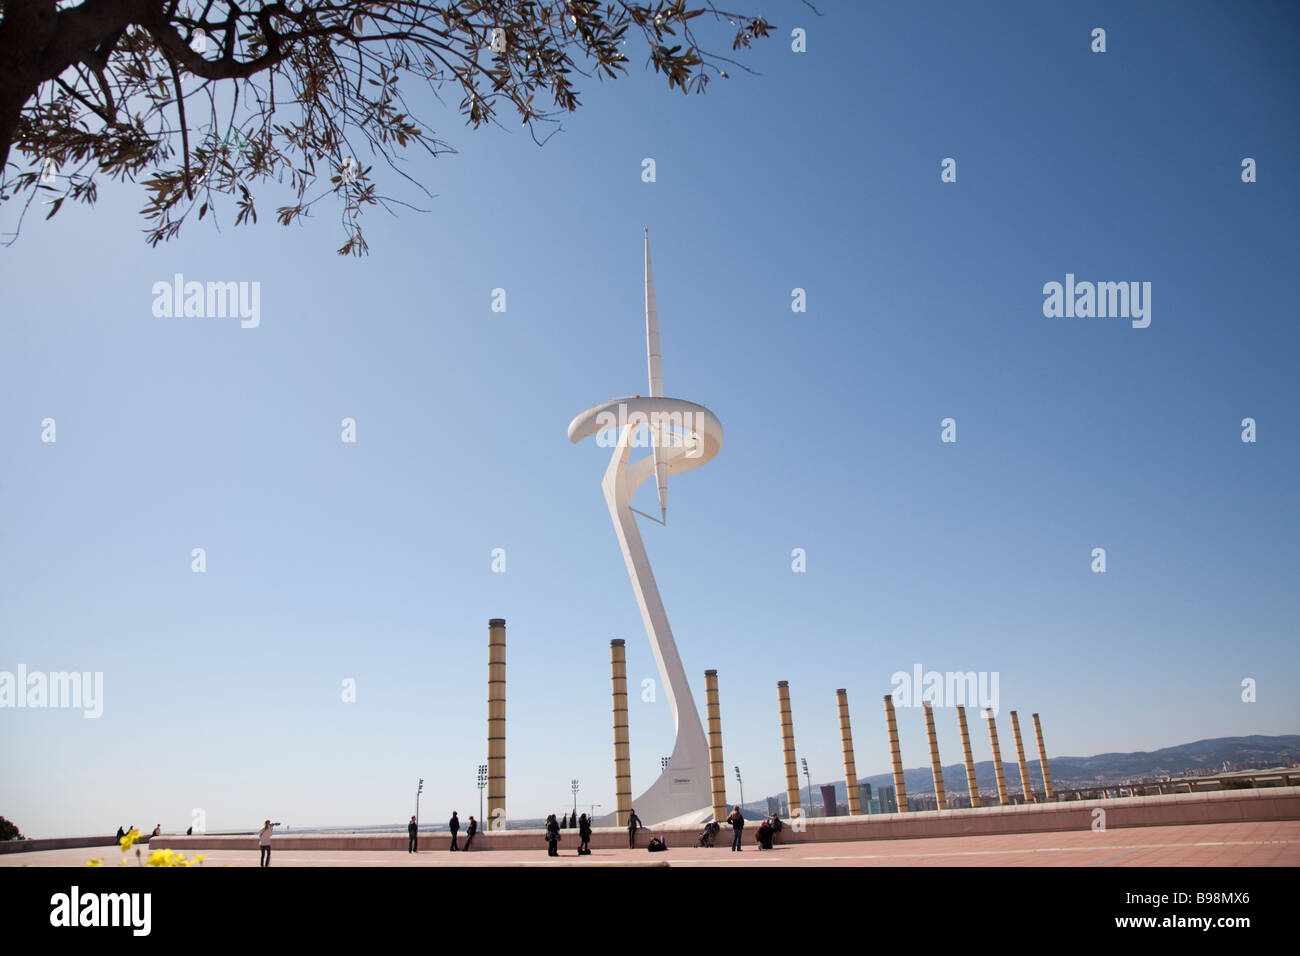 Olympic Ring Barcelona Spain - Stock Image